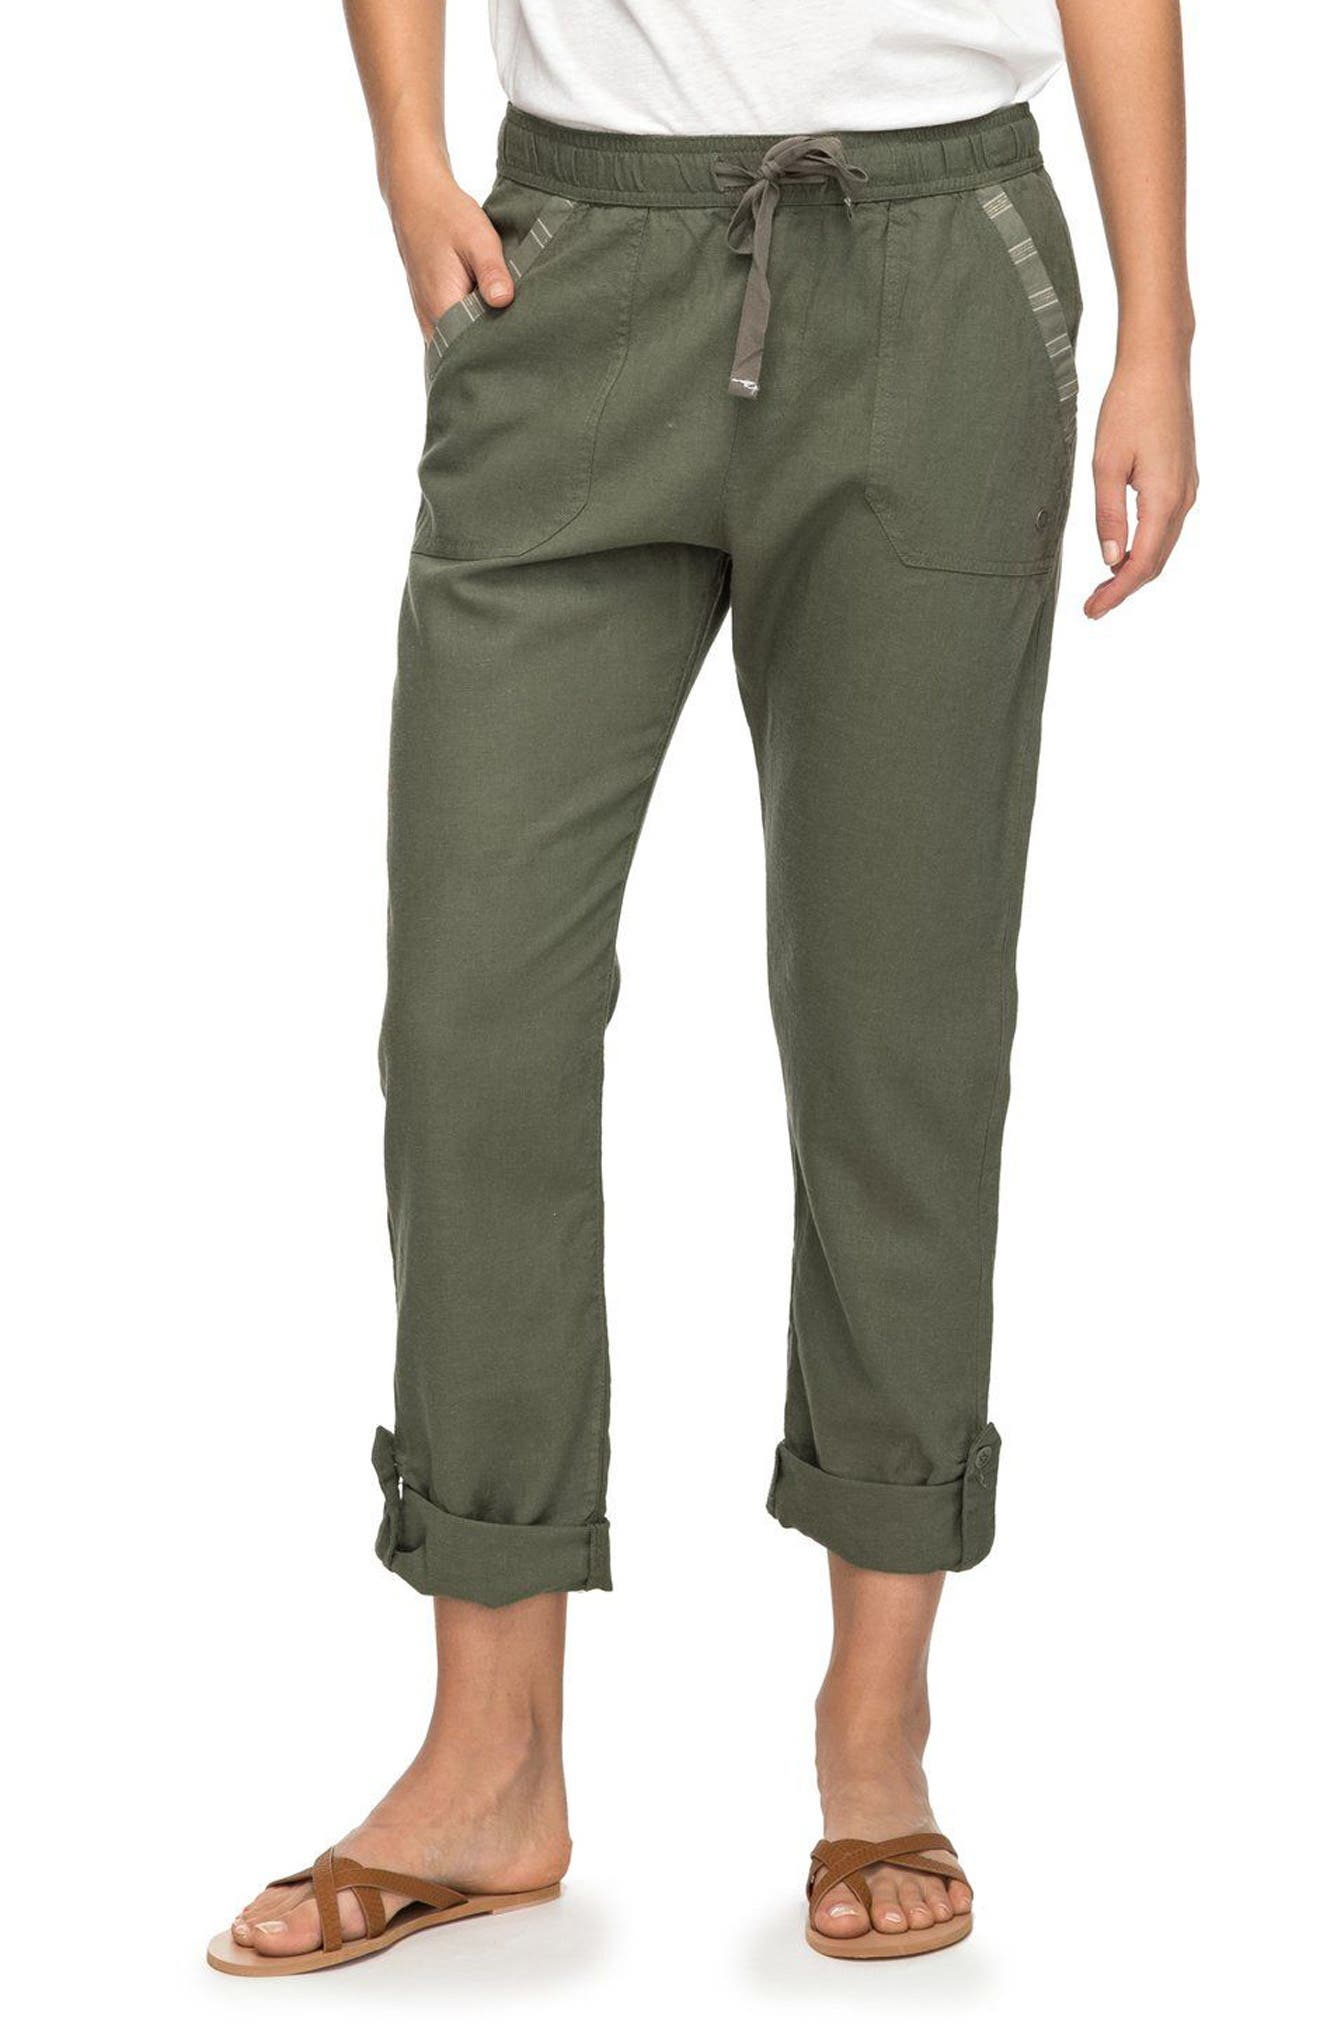 Symphony Lover Linen Blend Pants,                             Main thumbnail 1, color,                             Dusty Olive